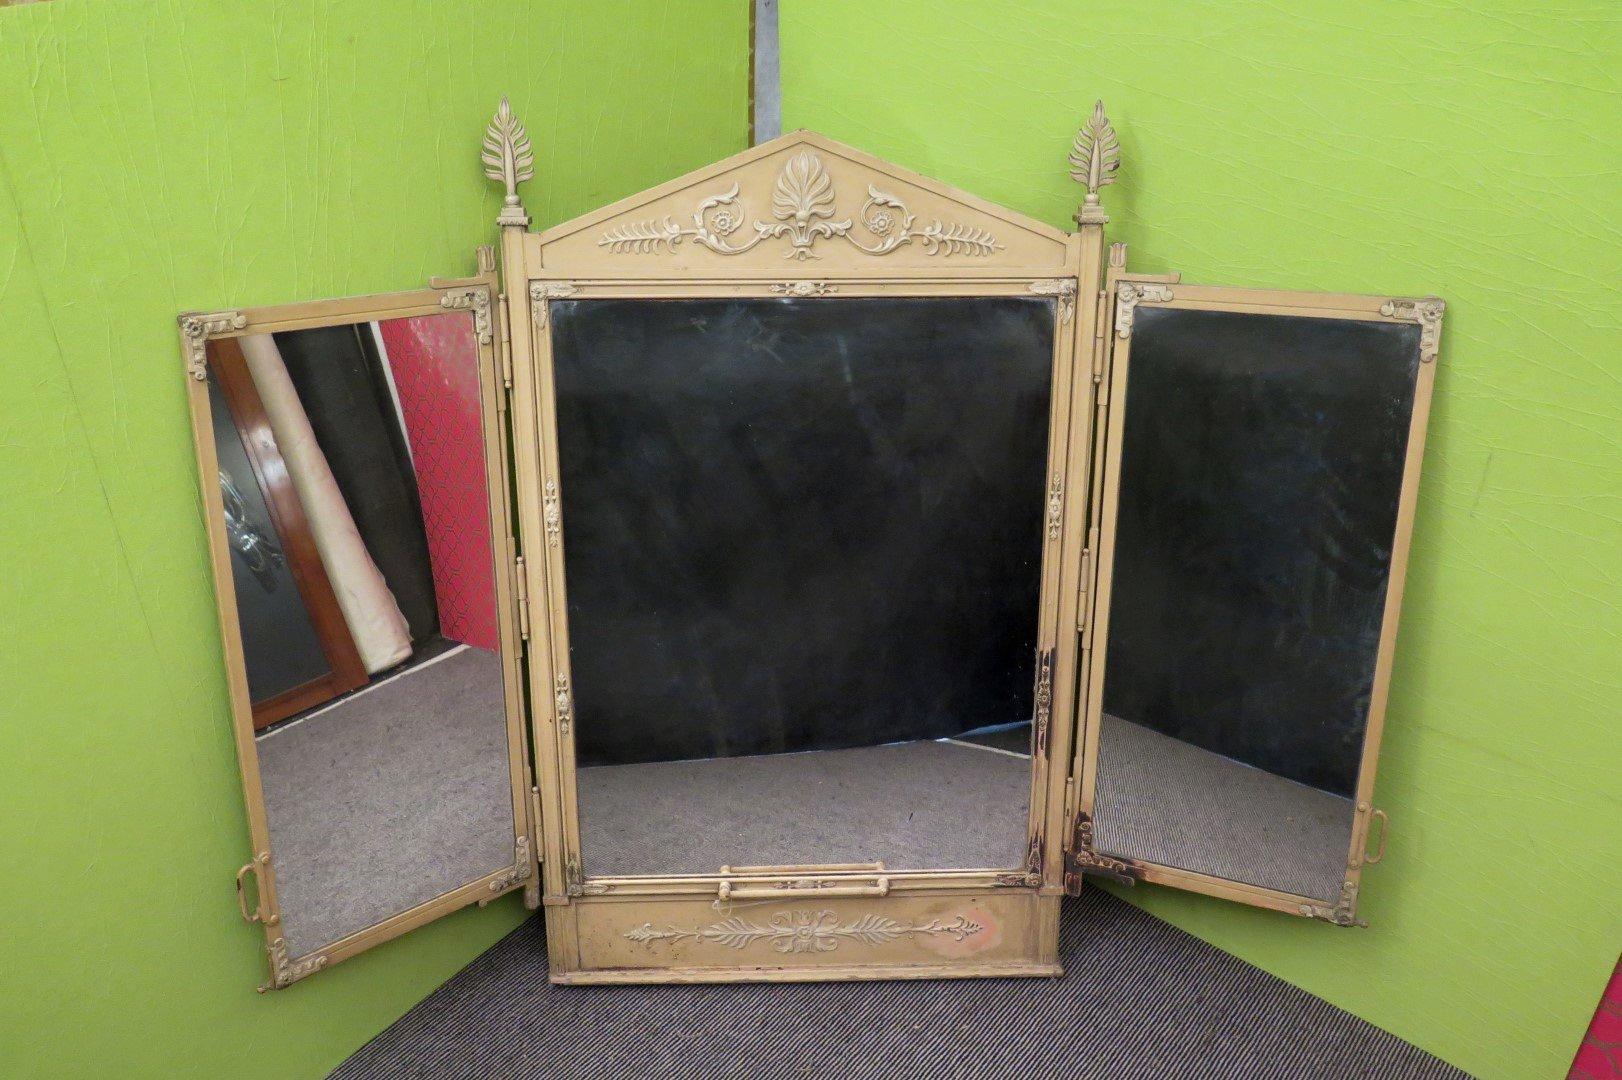 miroir de coiffure 1930s en vente sur pamono. Black Bedroom Furniture Sets. Home Design Ideas